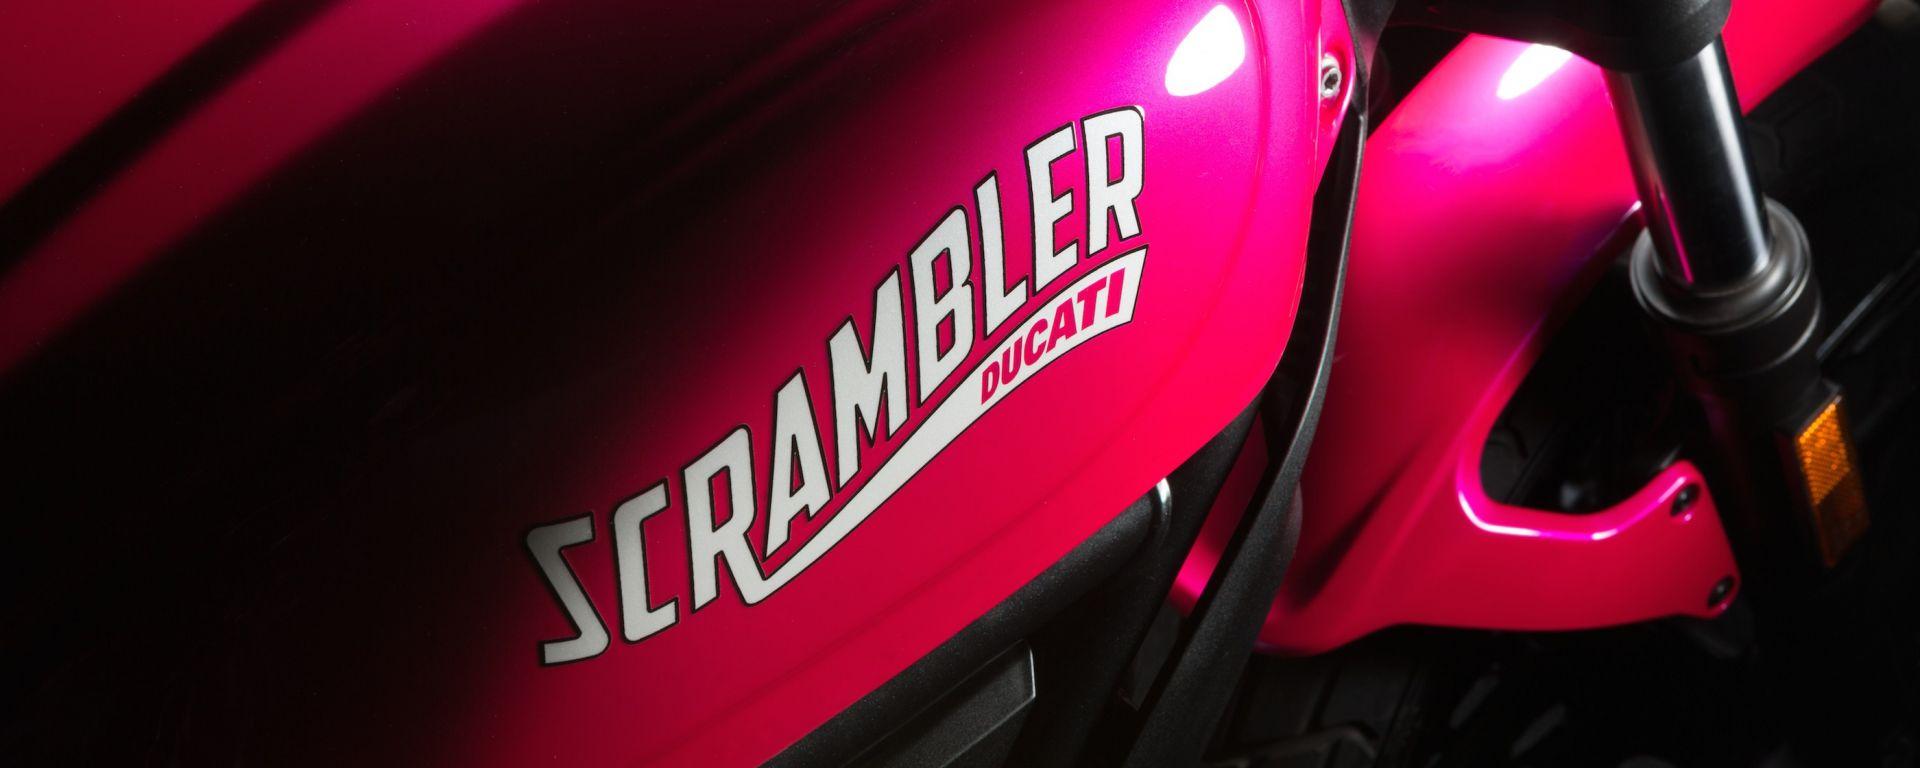 Ducati Scrambler Shocking, la special per la Notte Rosa 2016